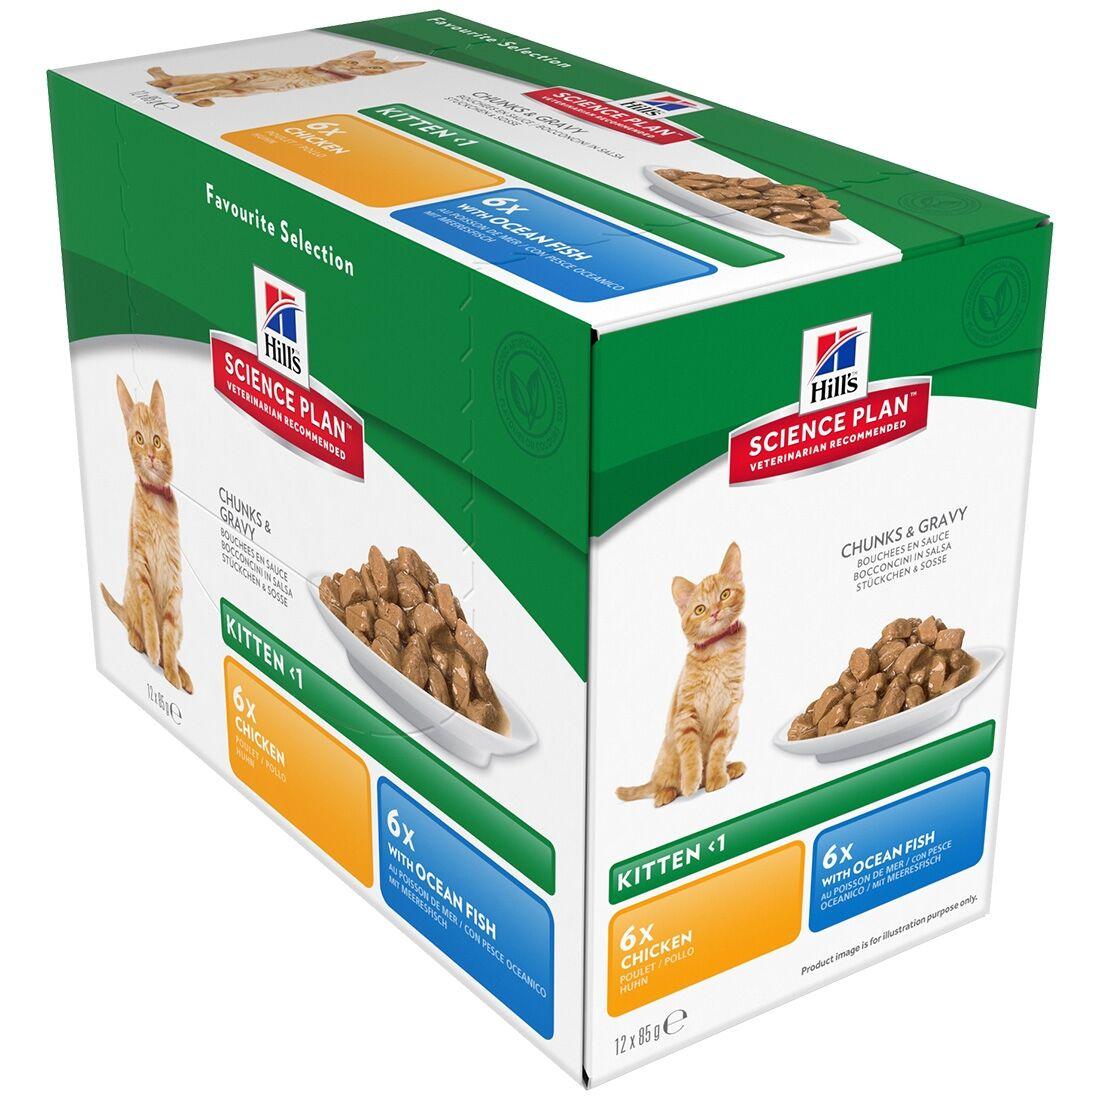 Hill's Science Plan Sachets repas Hill's Science Plan Kitten Contenance : 12 sachets de 85 g, Saveur : 6 x Chicken + 6 x Turkey